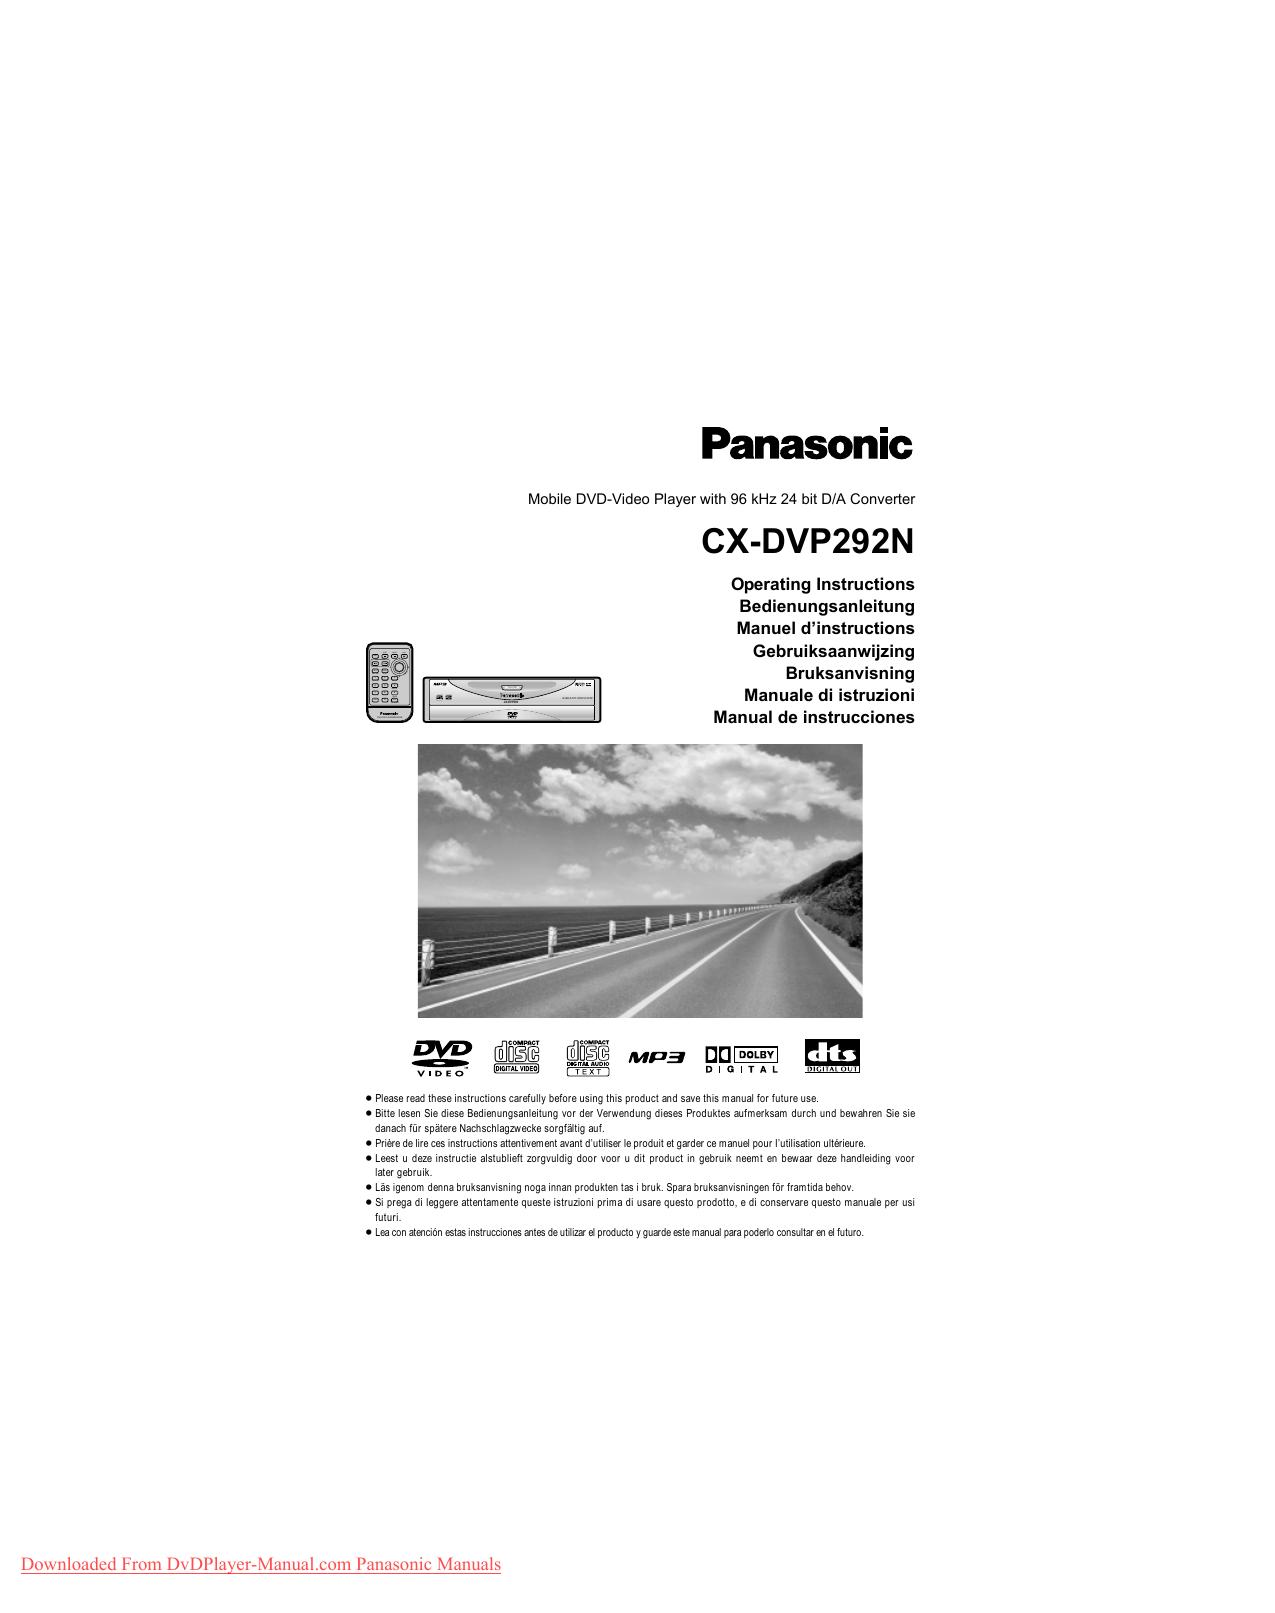 Panasonic CX-DVP292N User Guide Manual | manualzz com